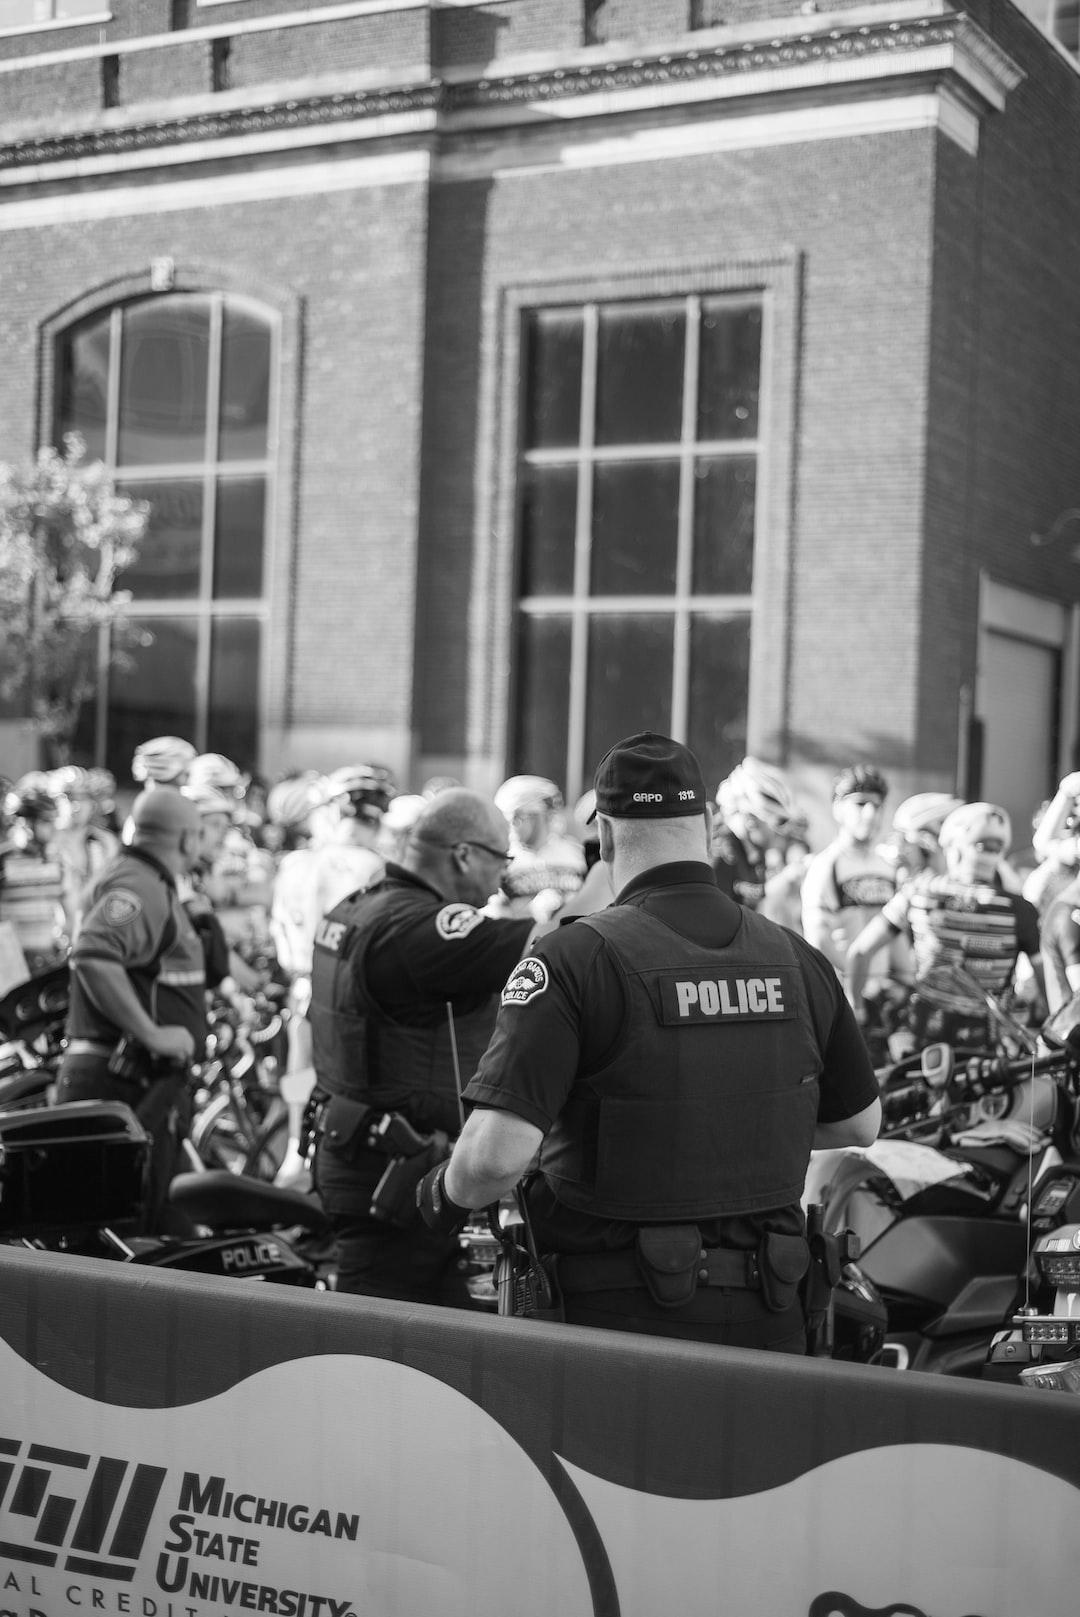 Road bike racers. Grand Rapids, MI in black and white